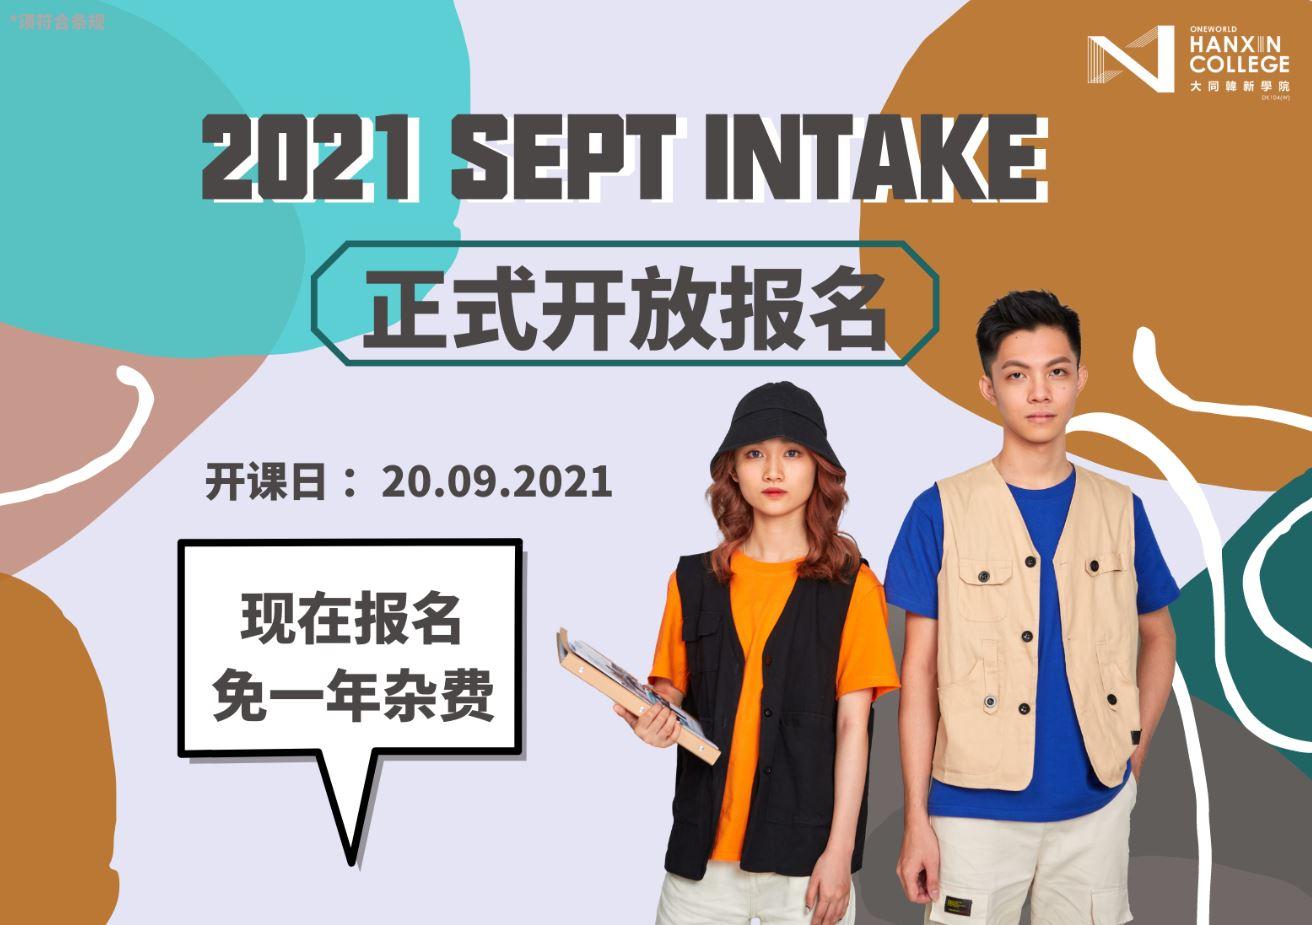 210627-D1-HanXin